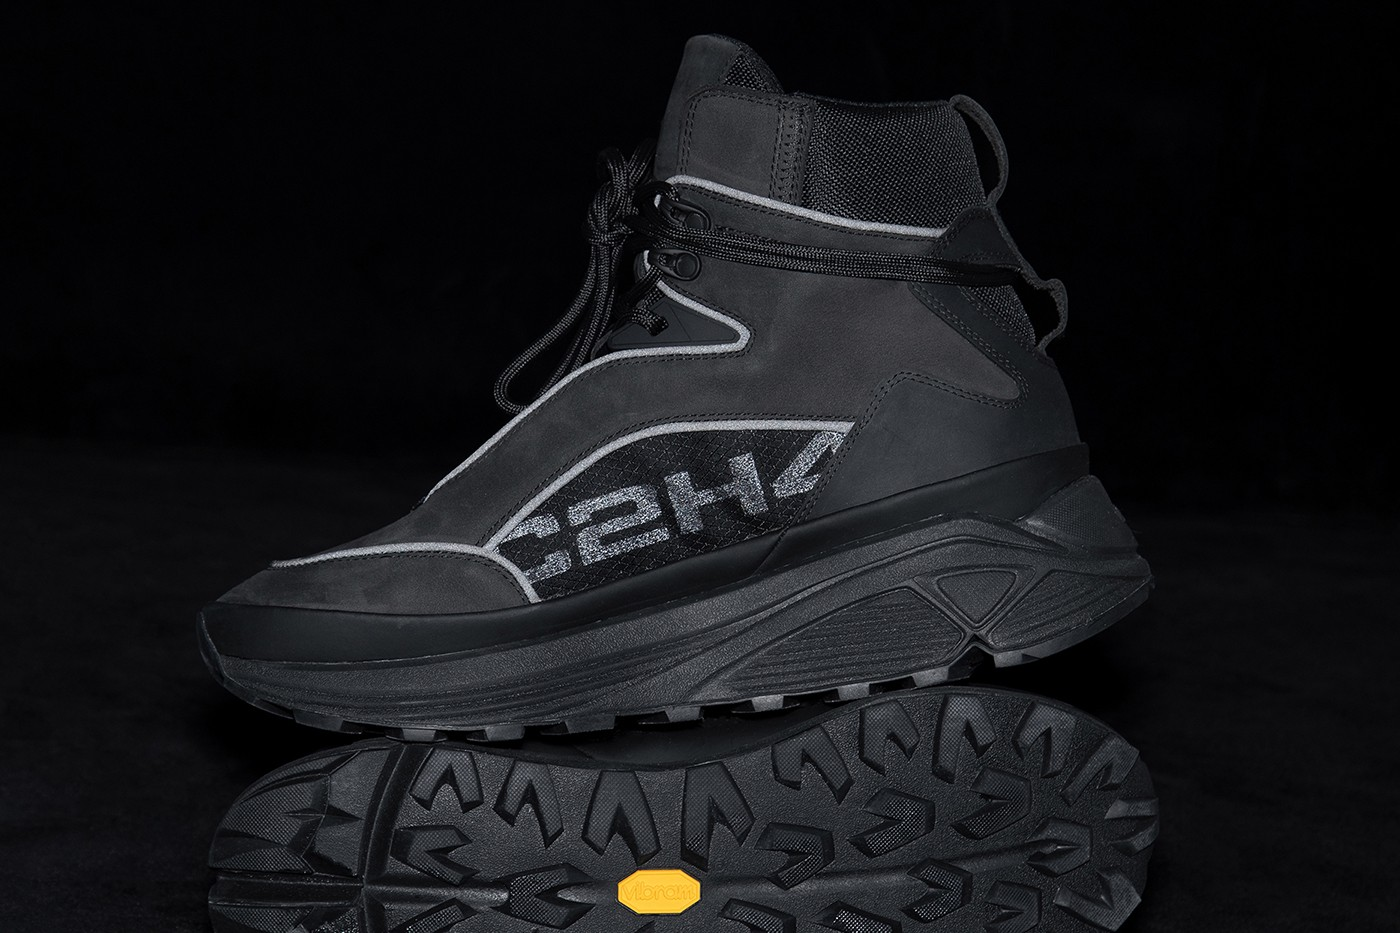 https___hypebeast.com_image_2020_11_c2h4-footwear-atom-alpha-quark-alpha-release-info-008